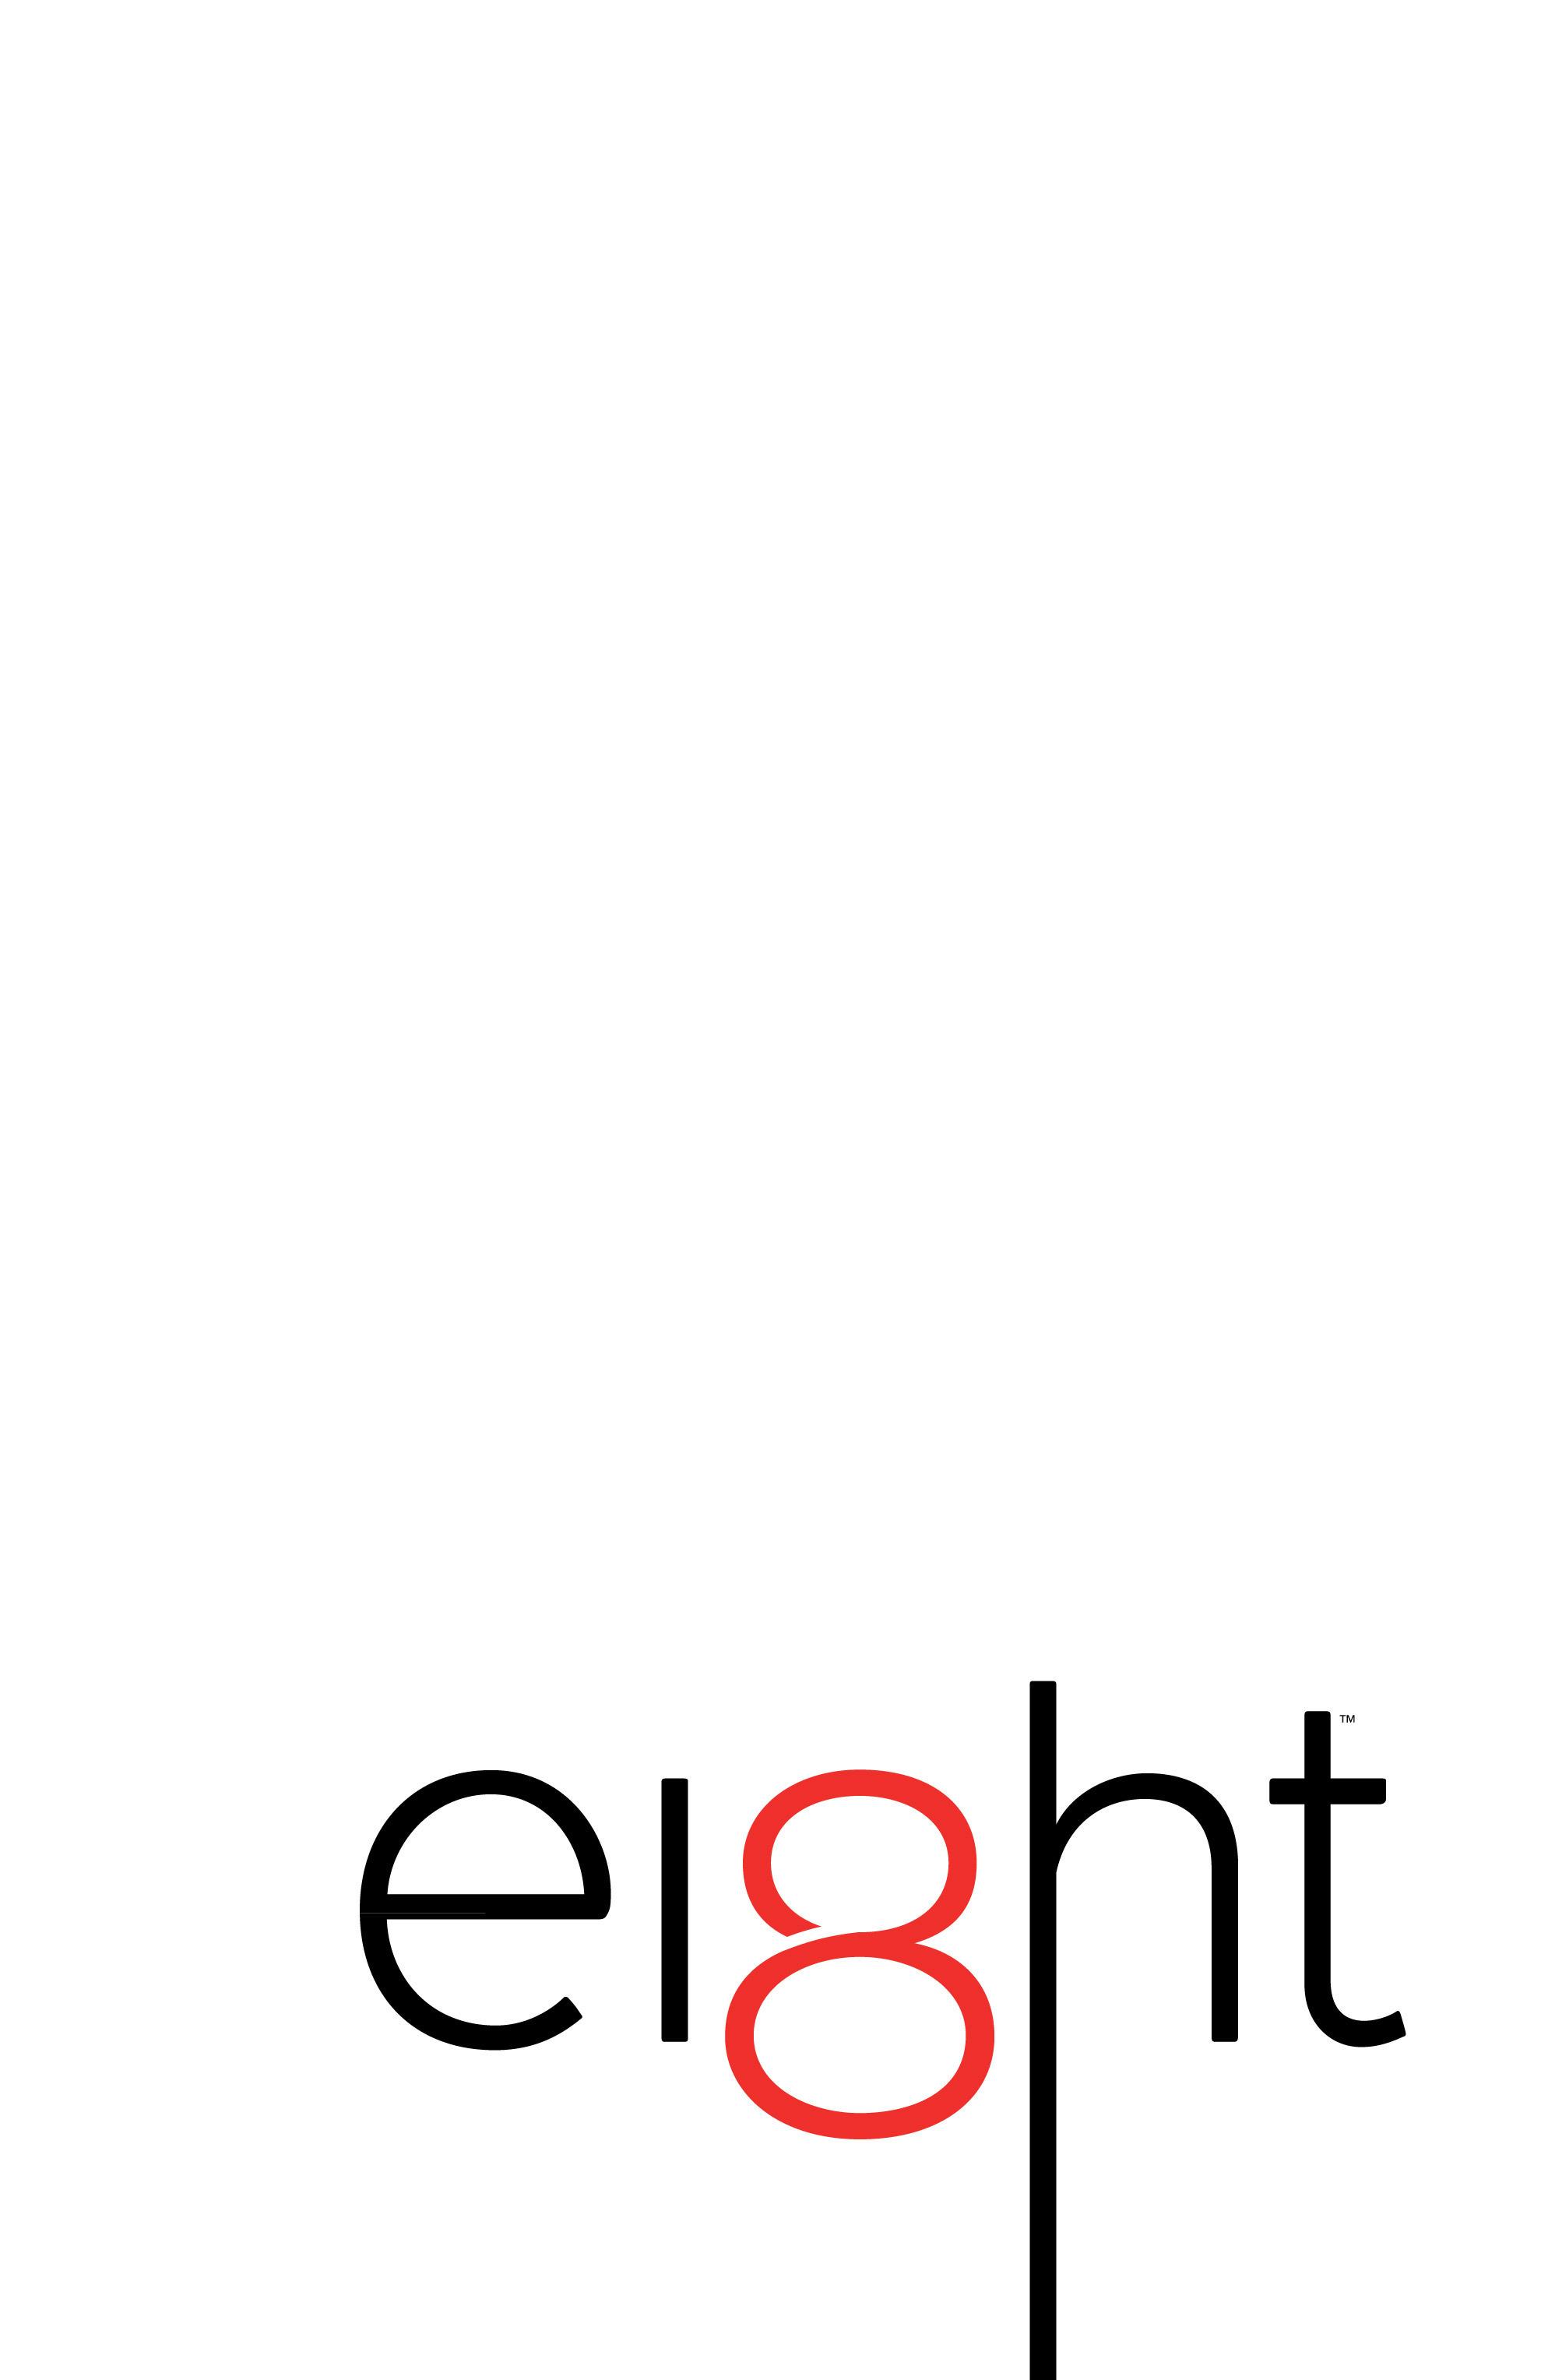 Read online Ei8ht comic -  Issue # TPB - 2